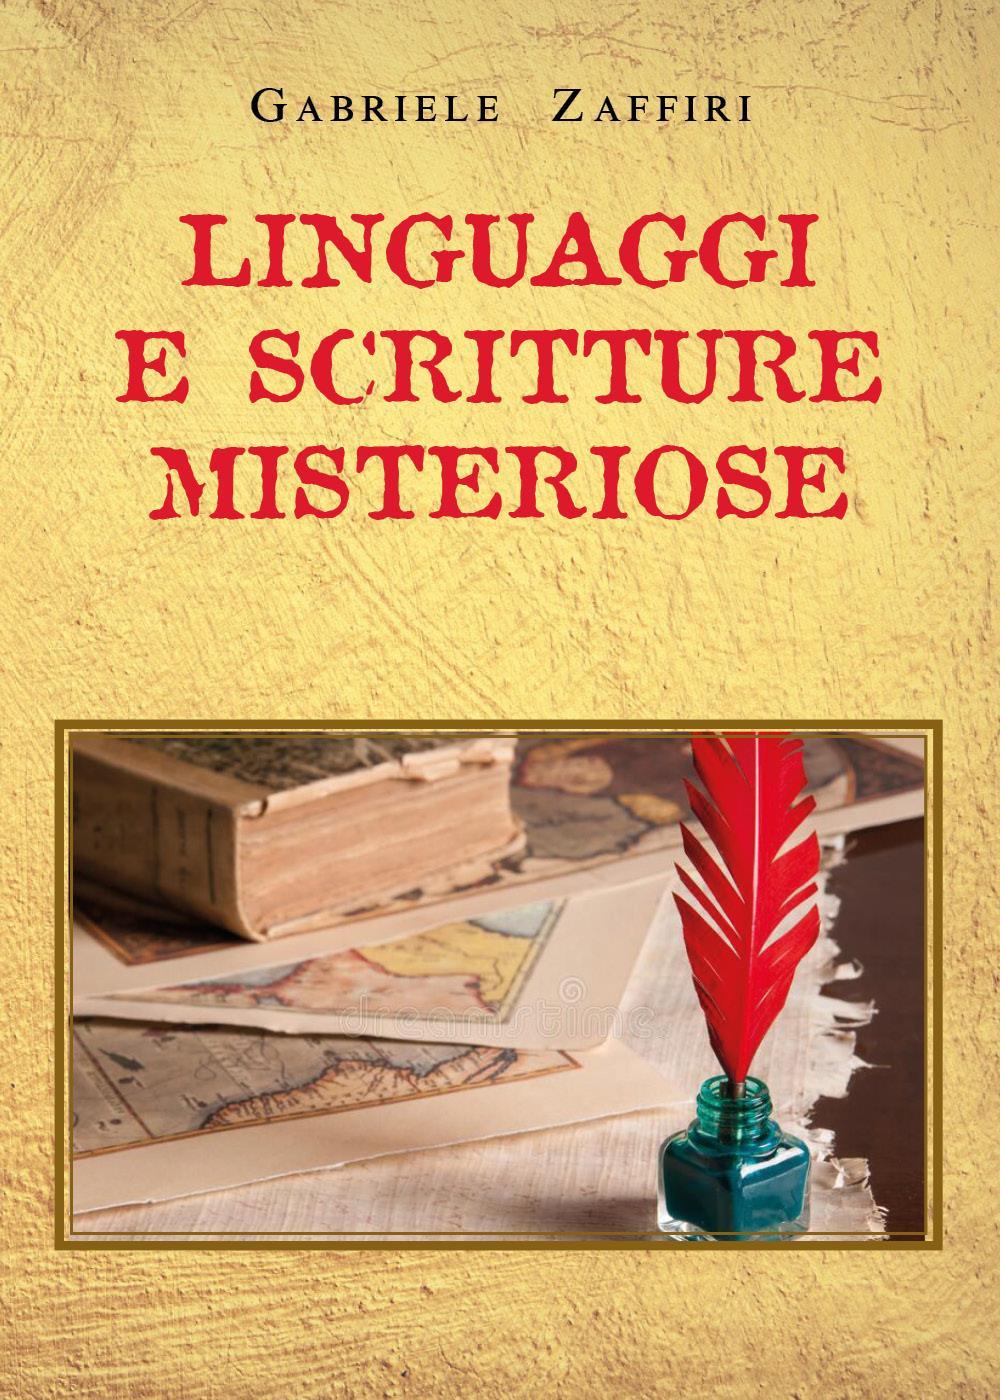 Linguaggi e scritture misteriose